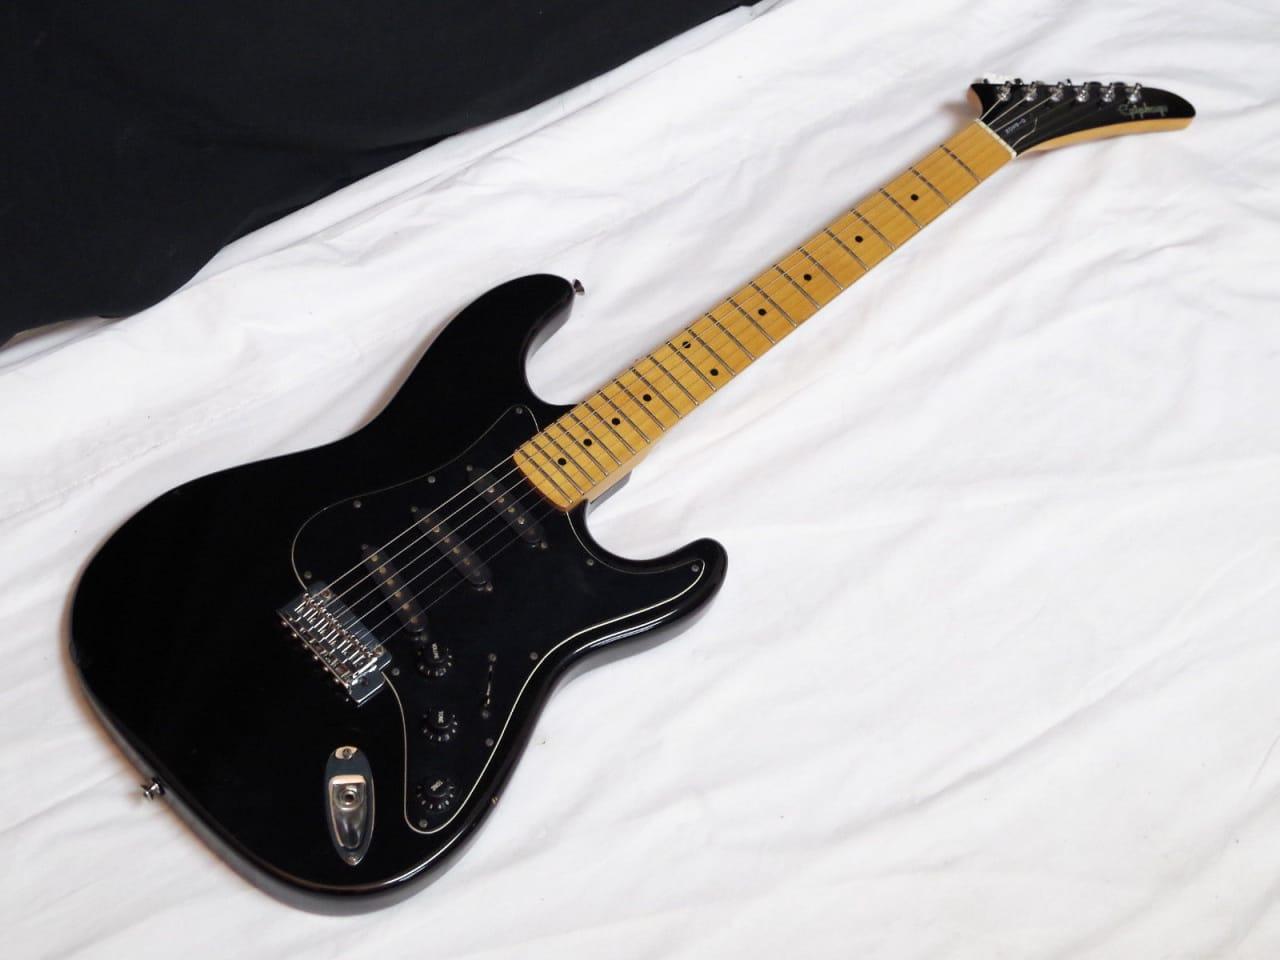 epiphone gibson black electric guitar made in korea used reverb. Black Bedroom Furniture Sets. Home Design Ideas